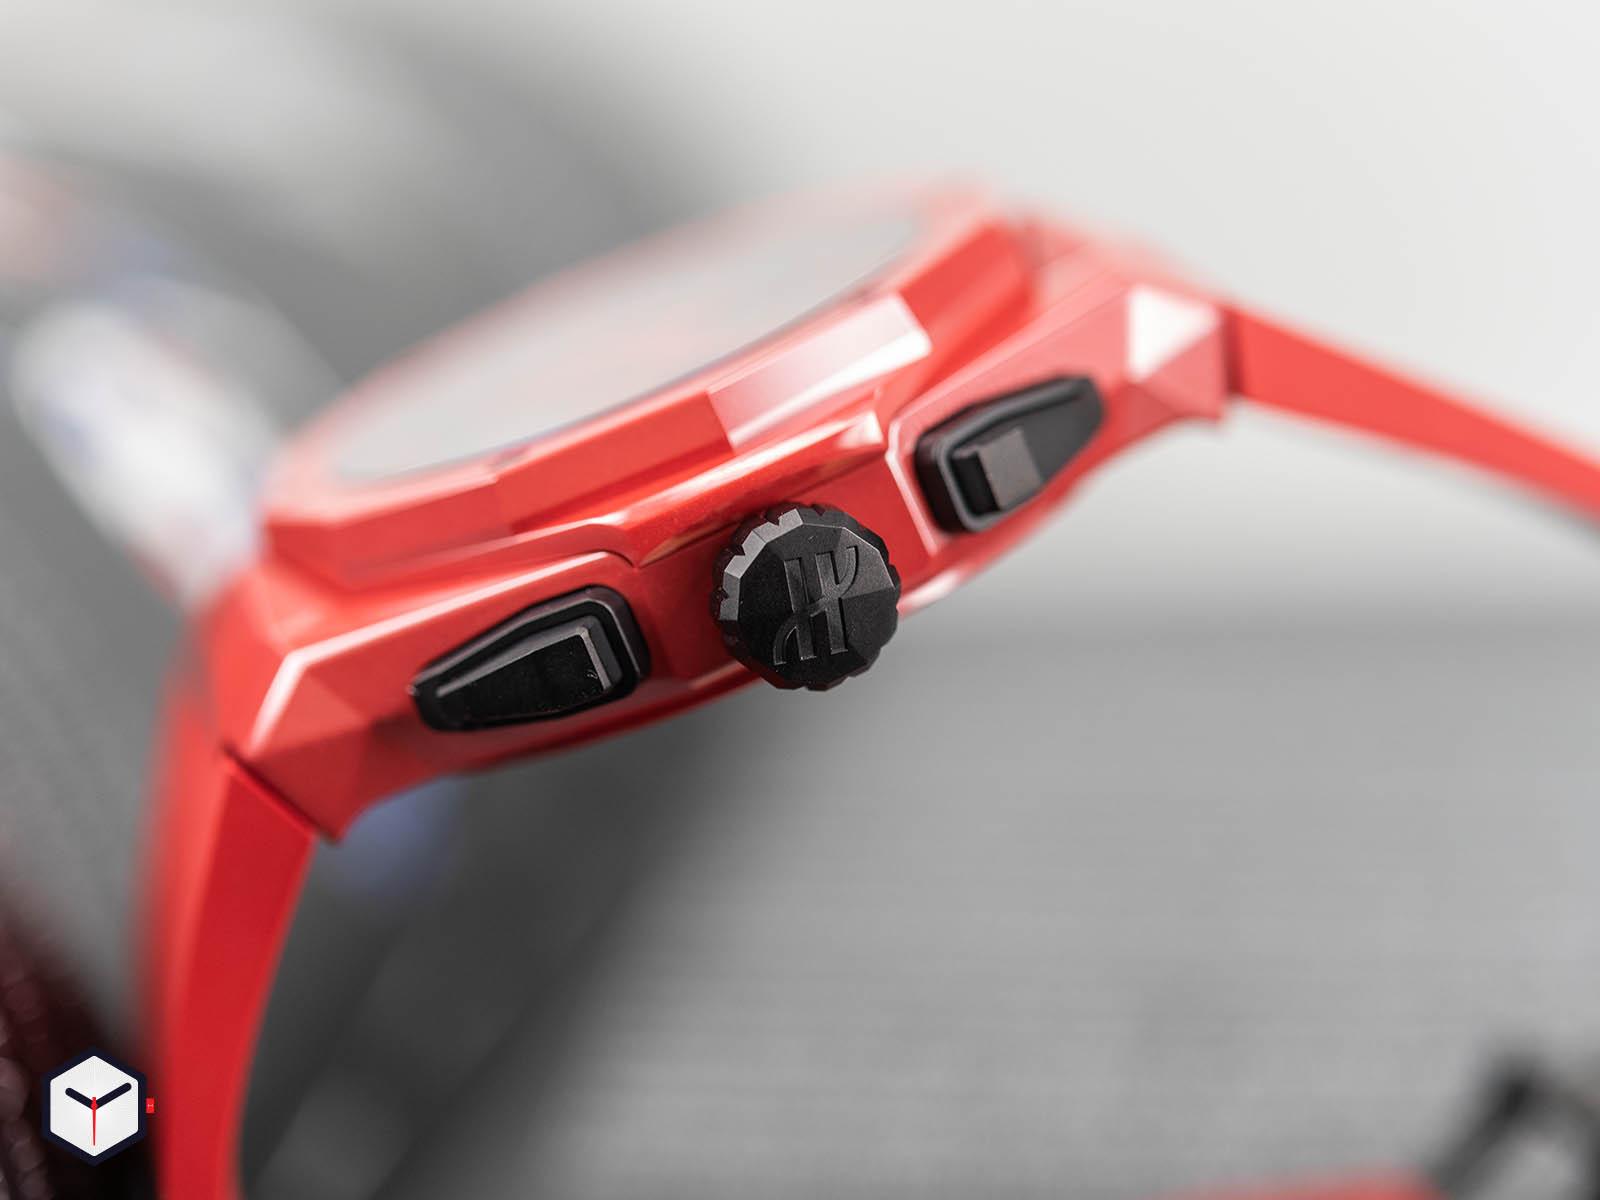 525-cf-0130-rx-orl19-hublot-classic-fusion-chronograph-orlinski-red-ceramic-5.jpg